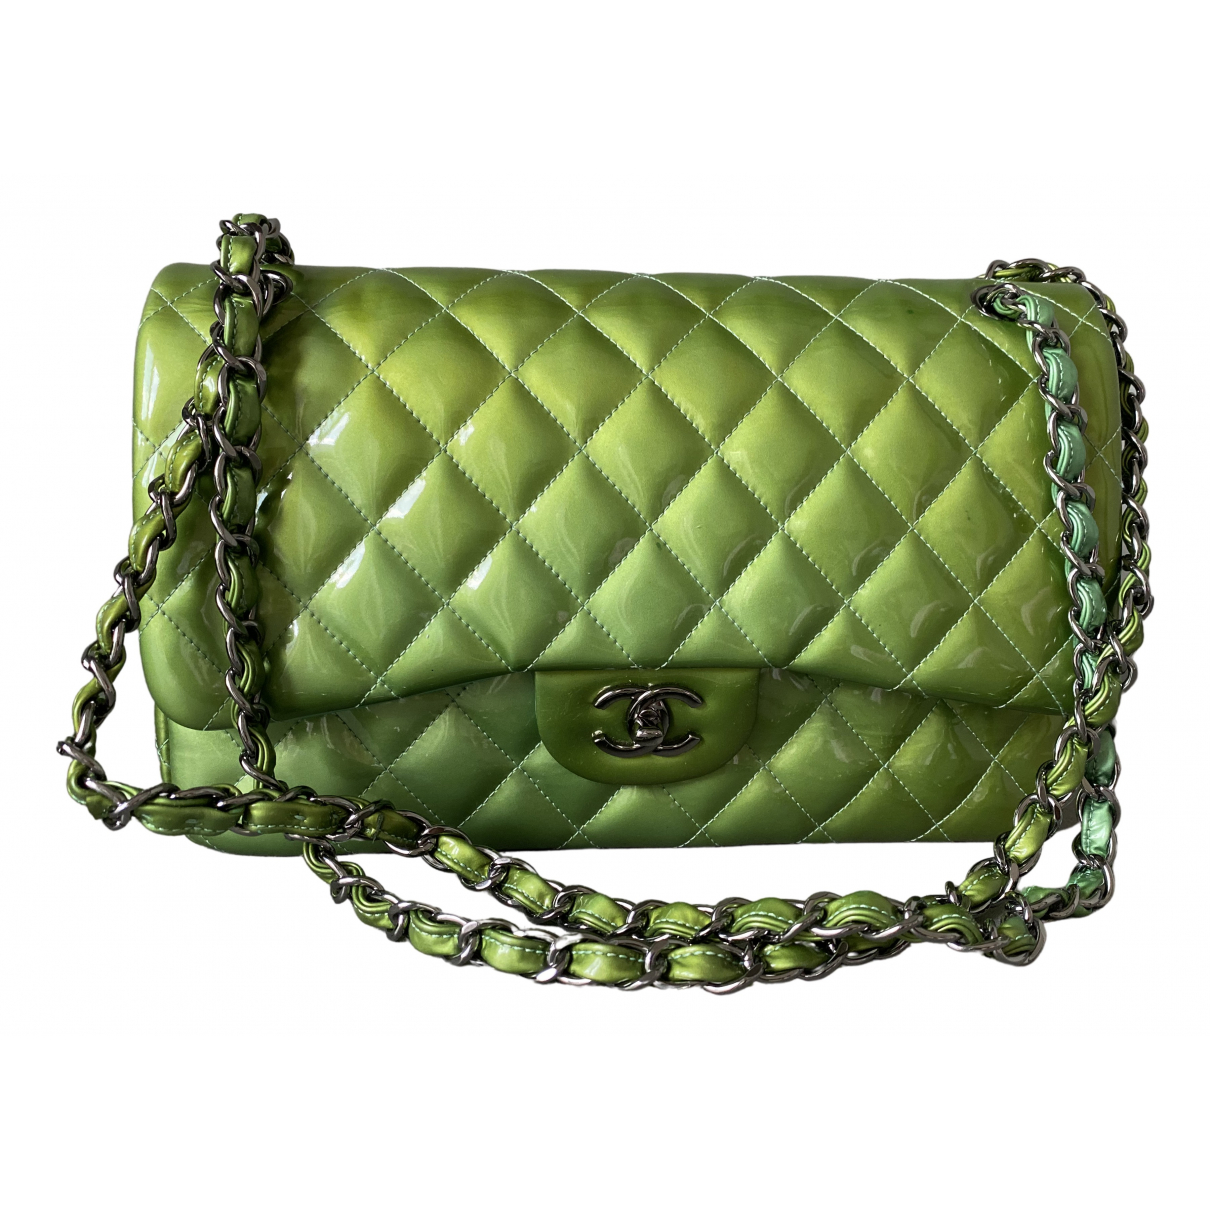 Bolso  Timeless/Classique de Charol Chanel